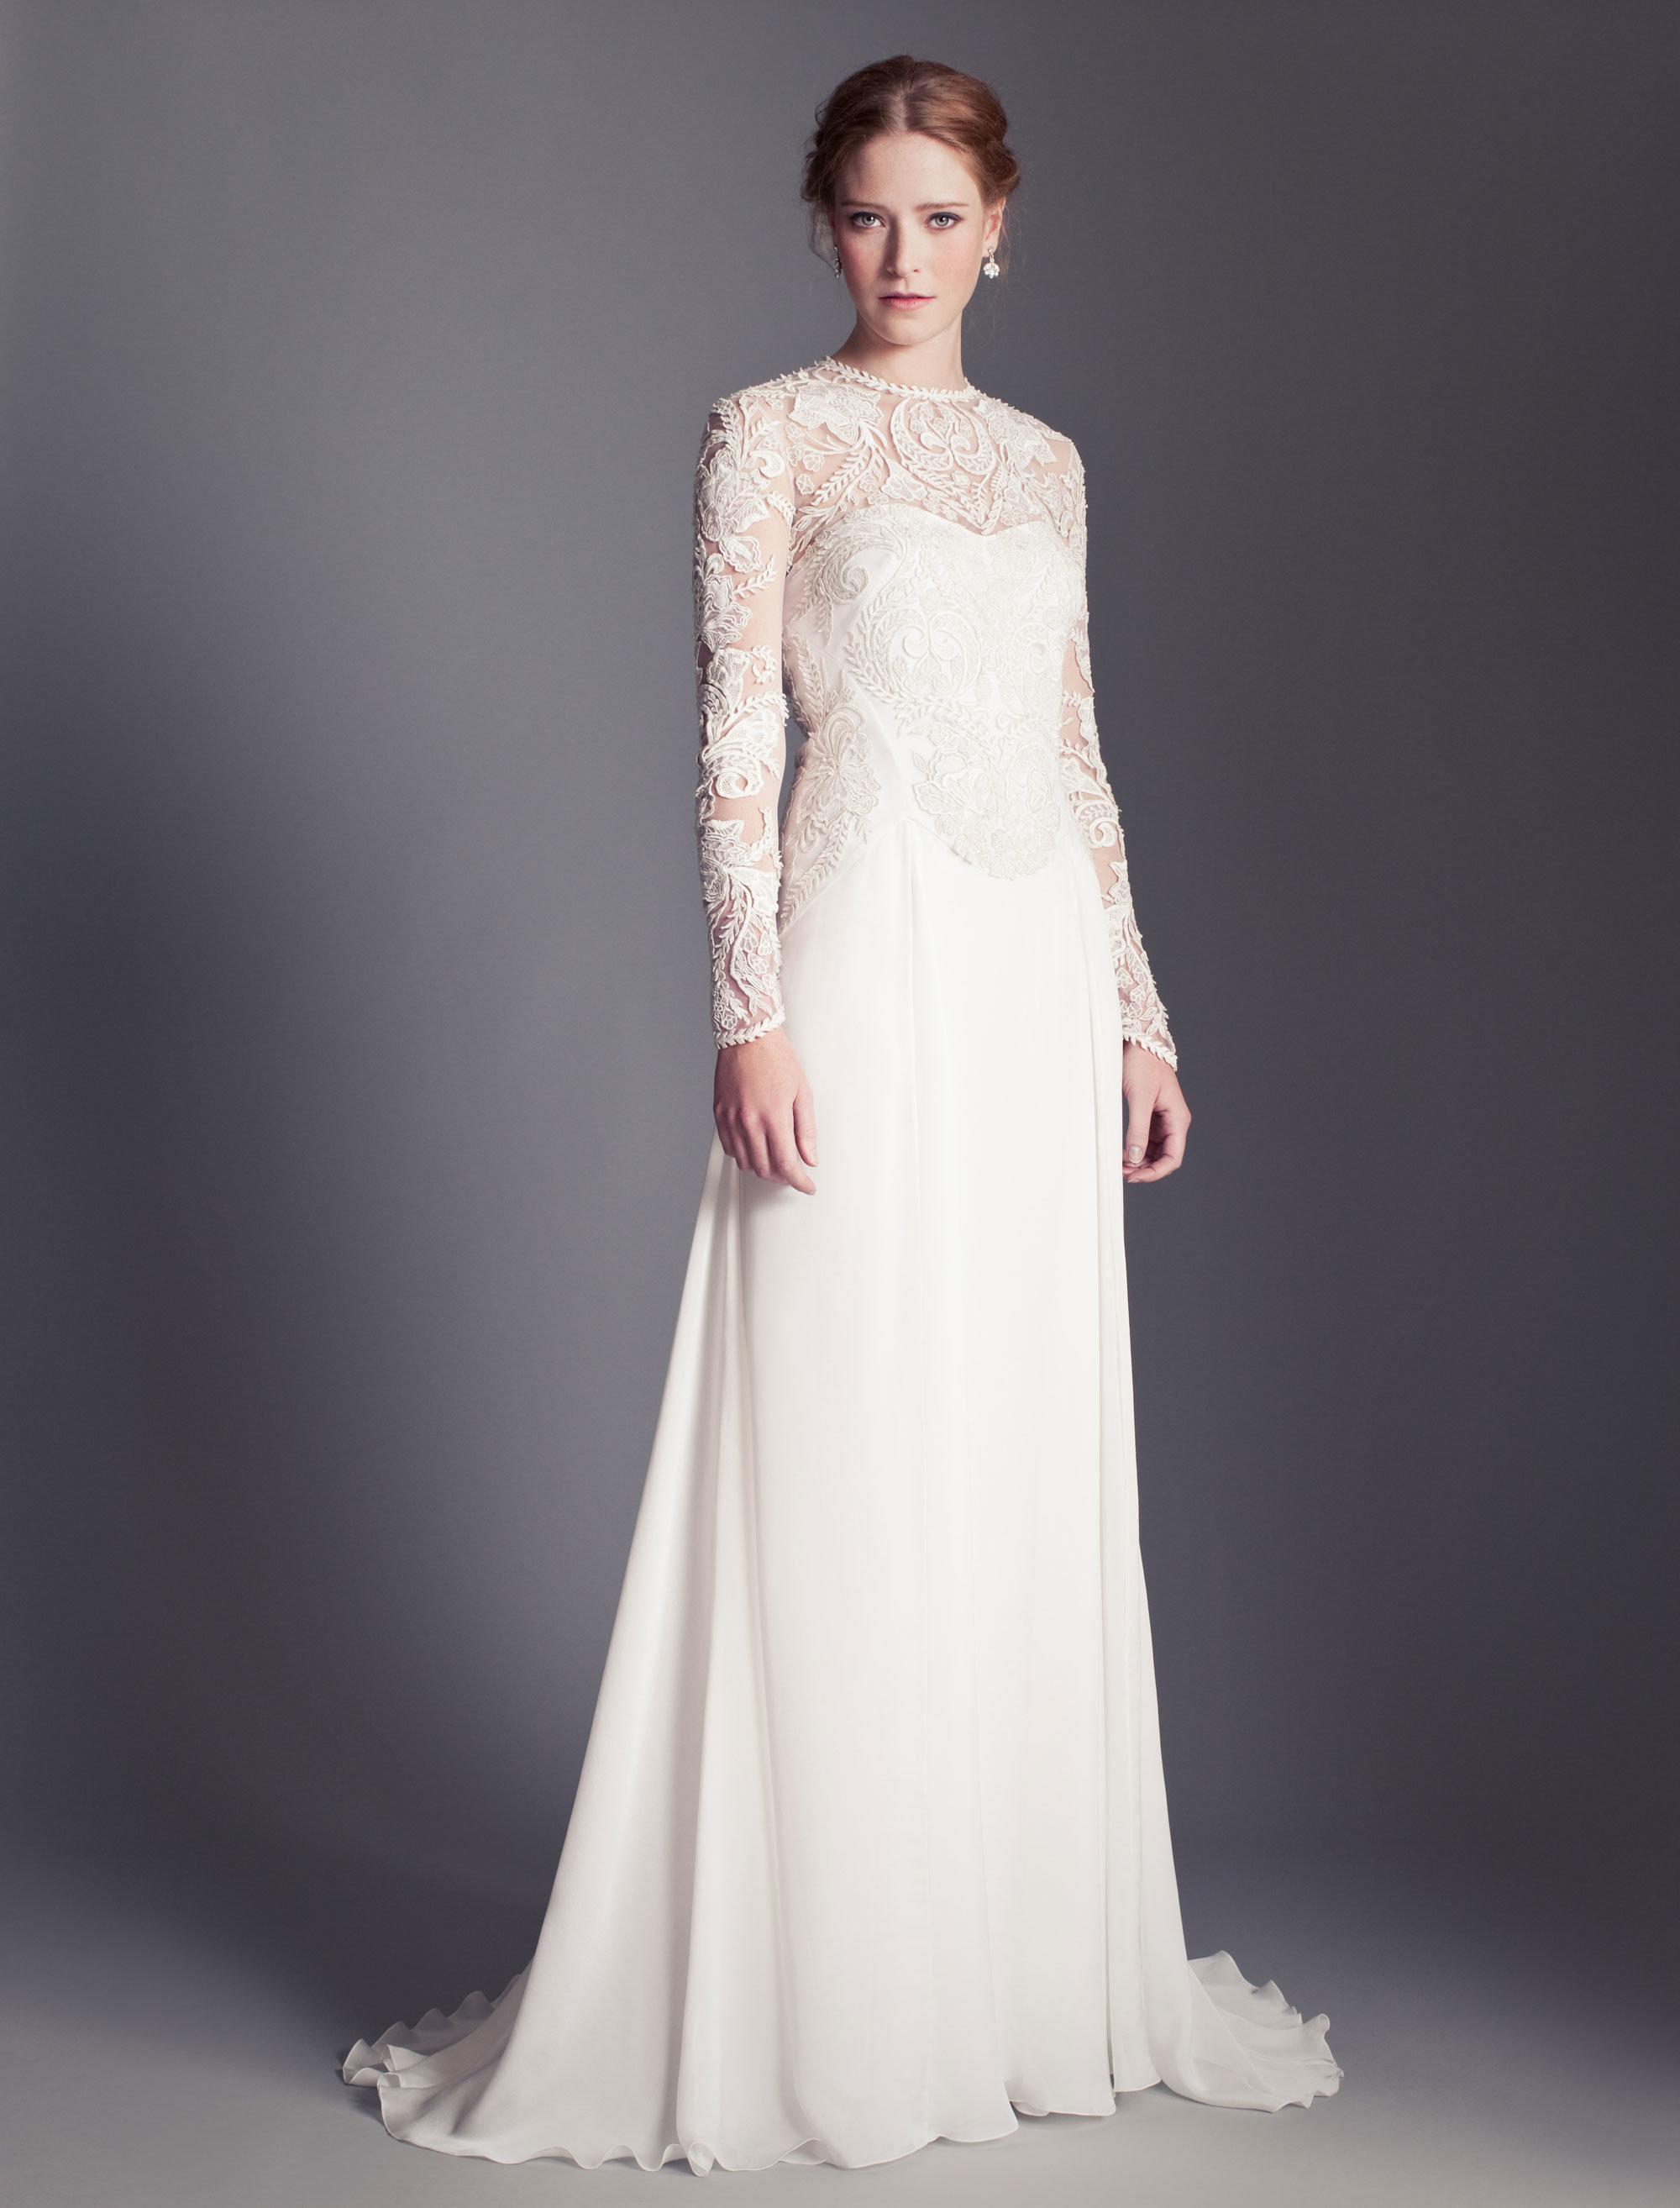 'downton Abbey' Wedding Inspiration: Lady Mary Crawley Wedding Dress At Reisefeber.org